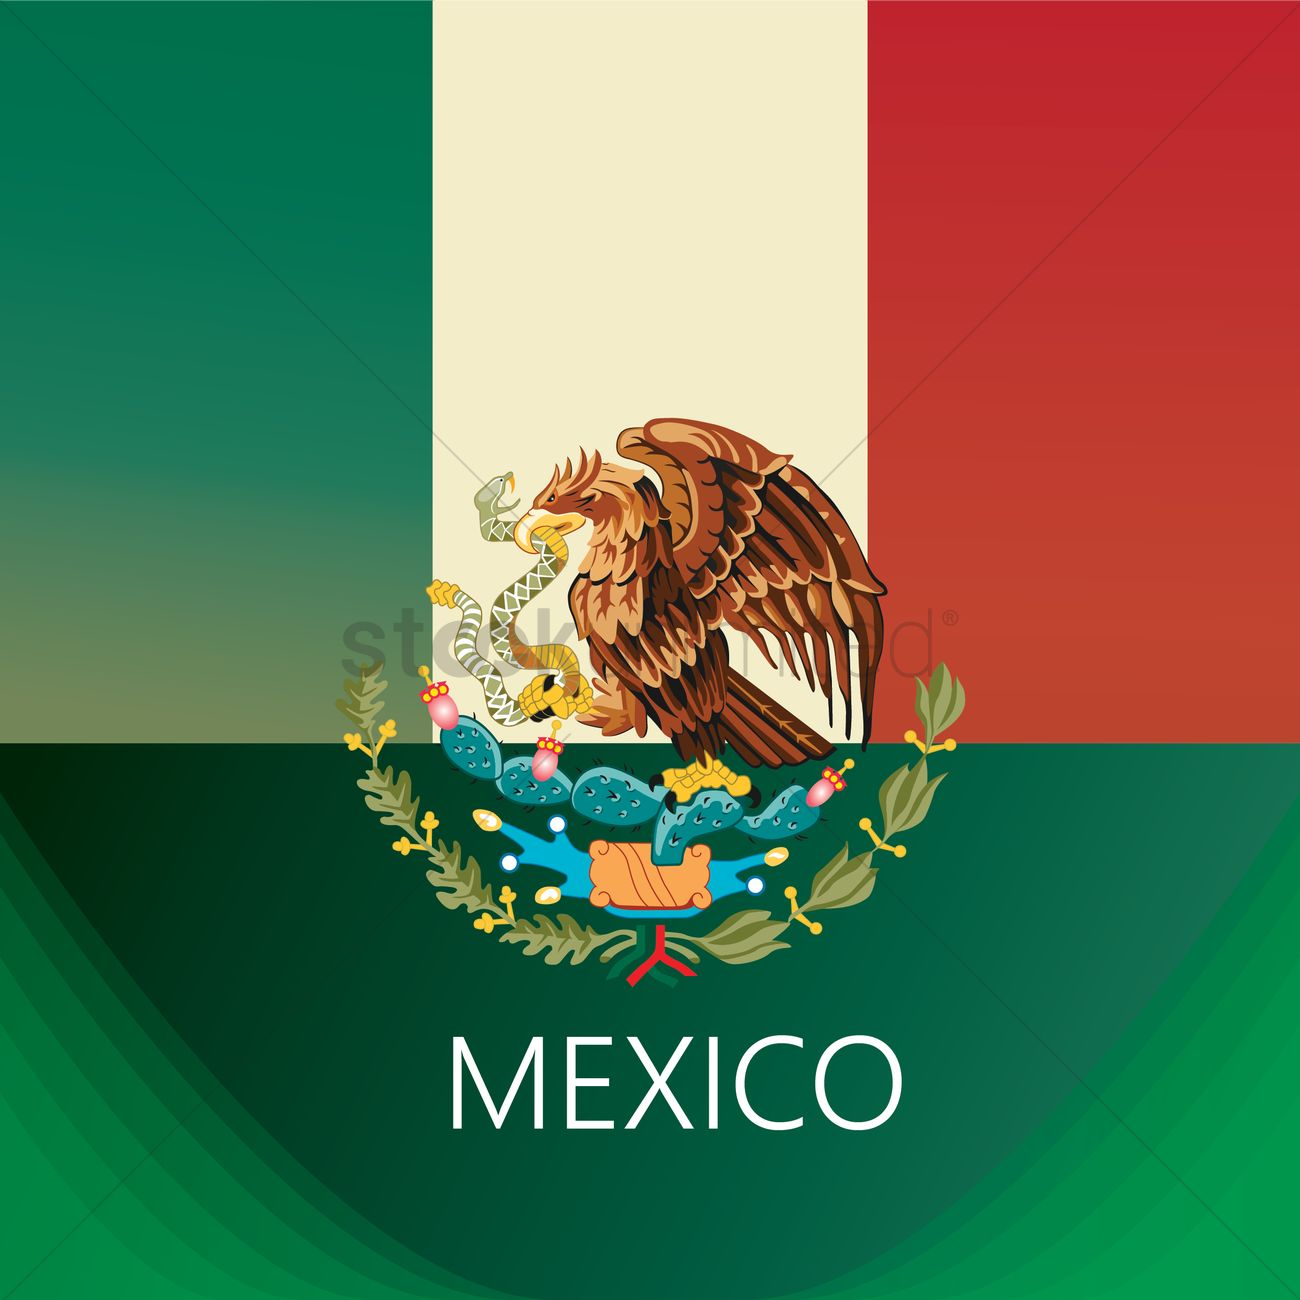 mexico flag background_1582280